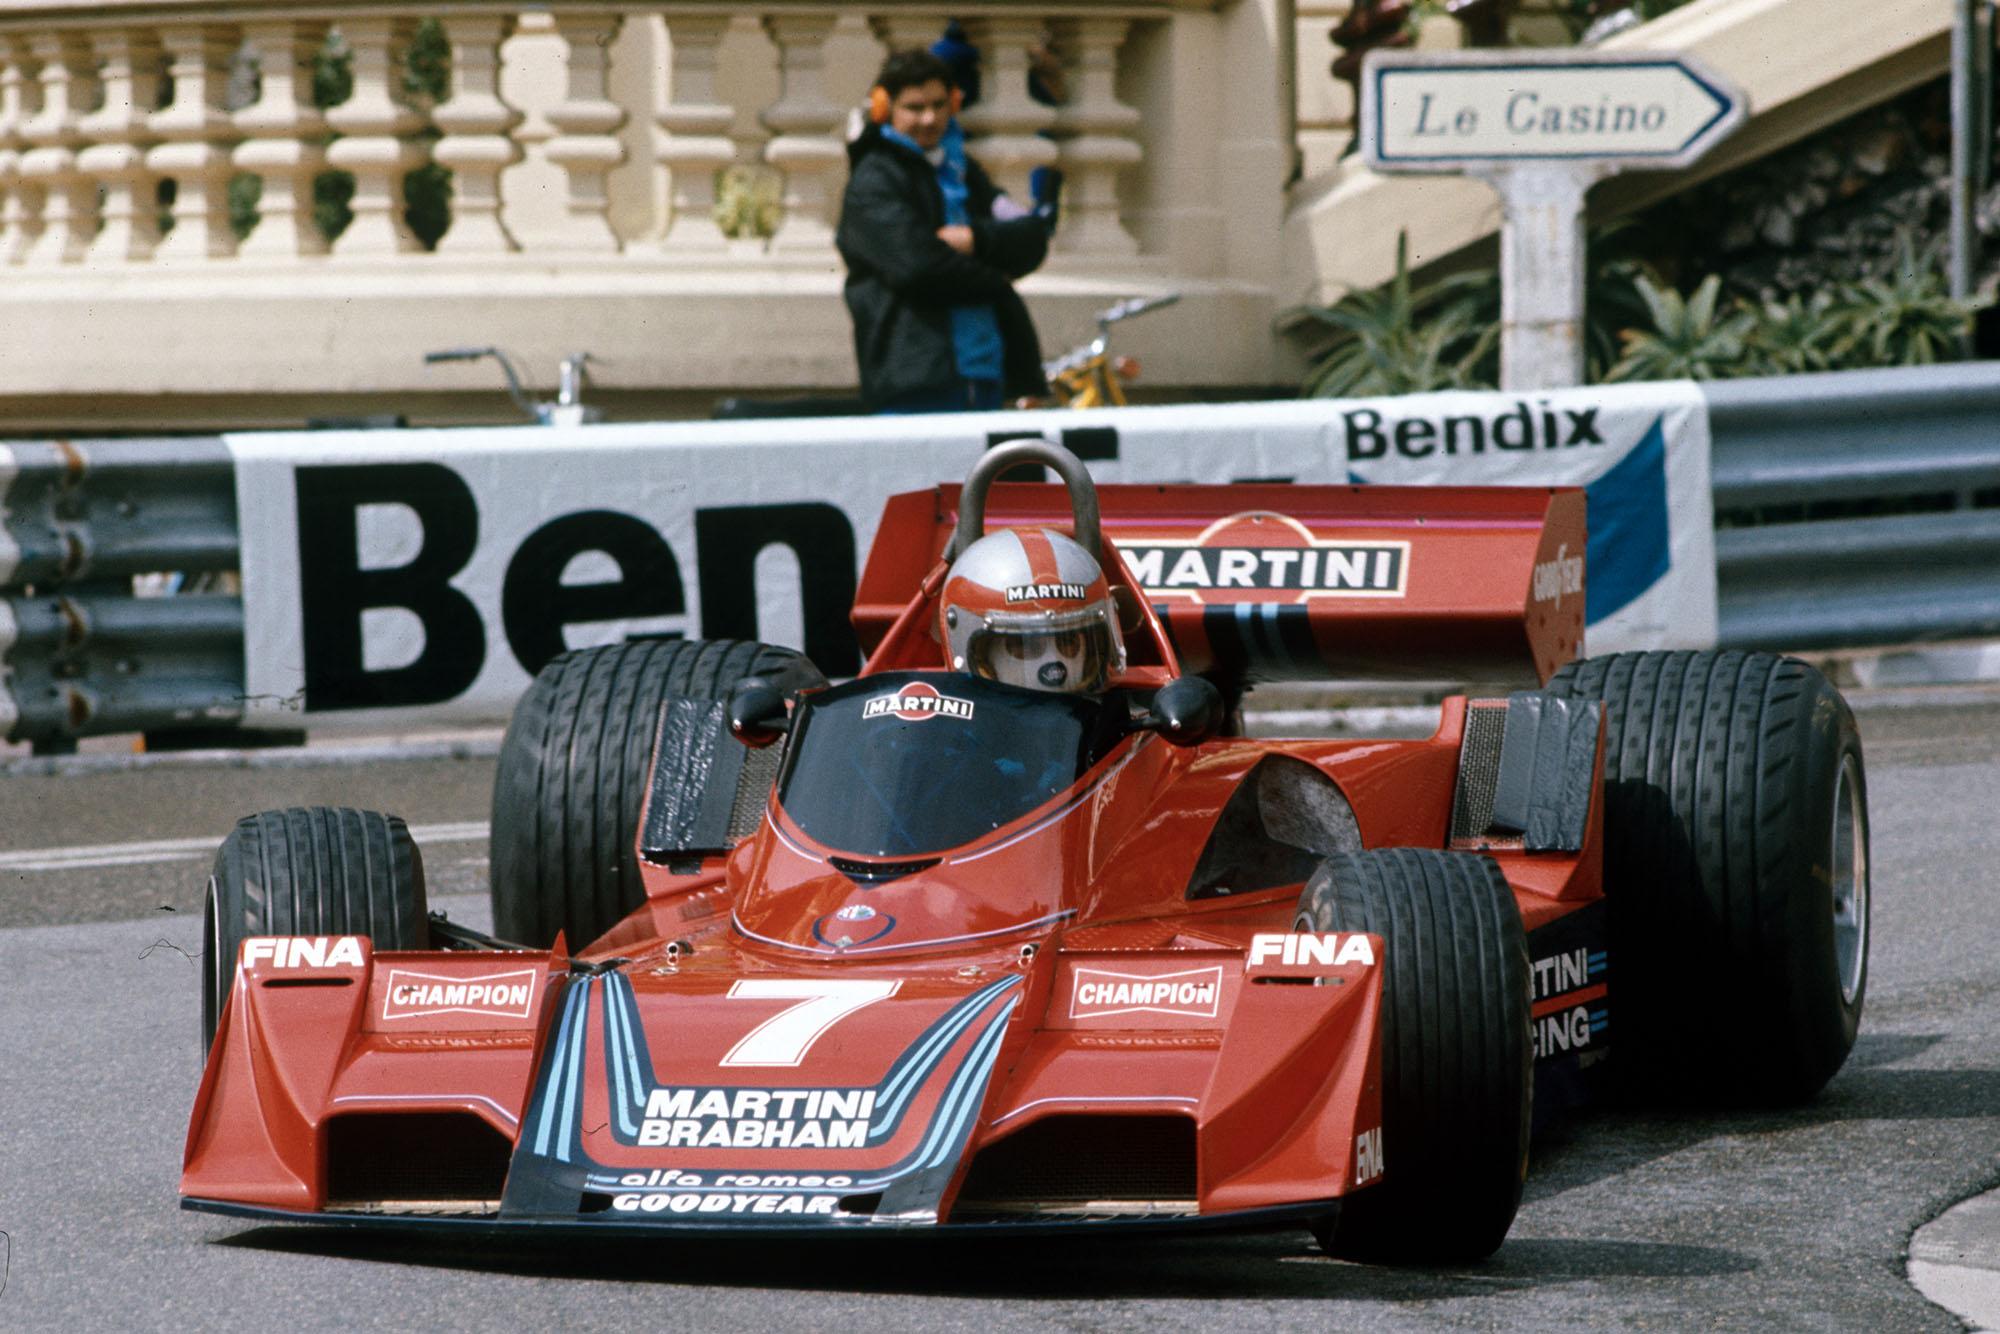 John Watson (Brabham) at the 1977 Monaco Grand Prix.